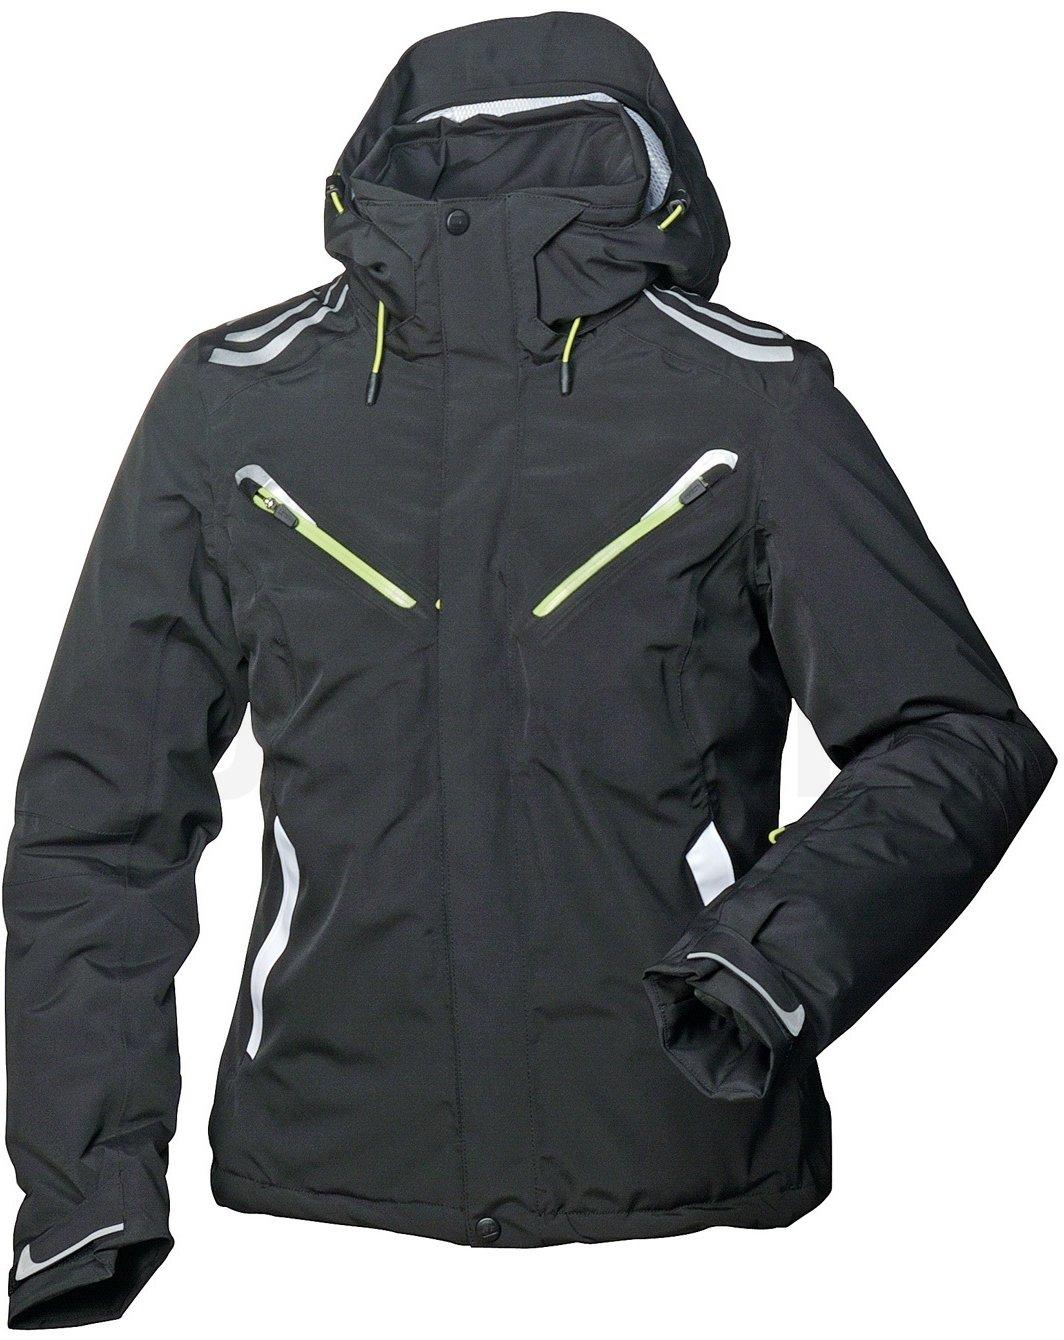 Lyžařská bunda Halti Force - černá